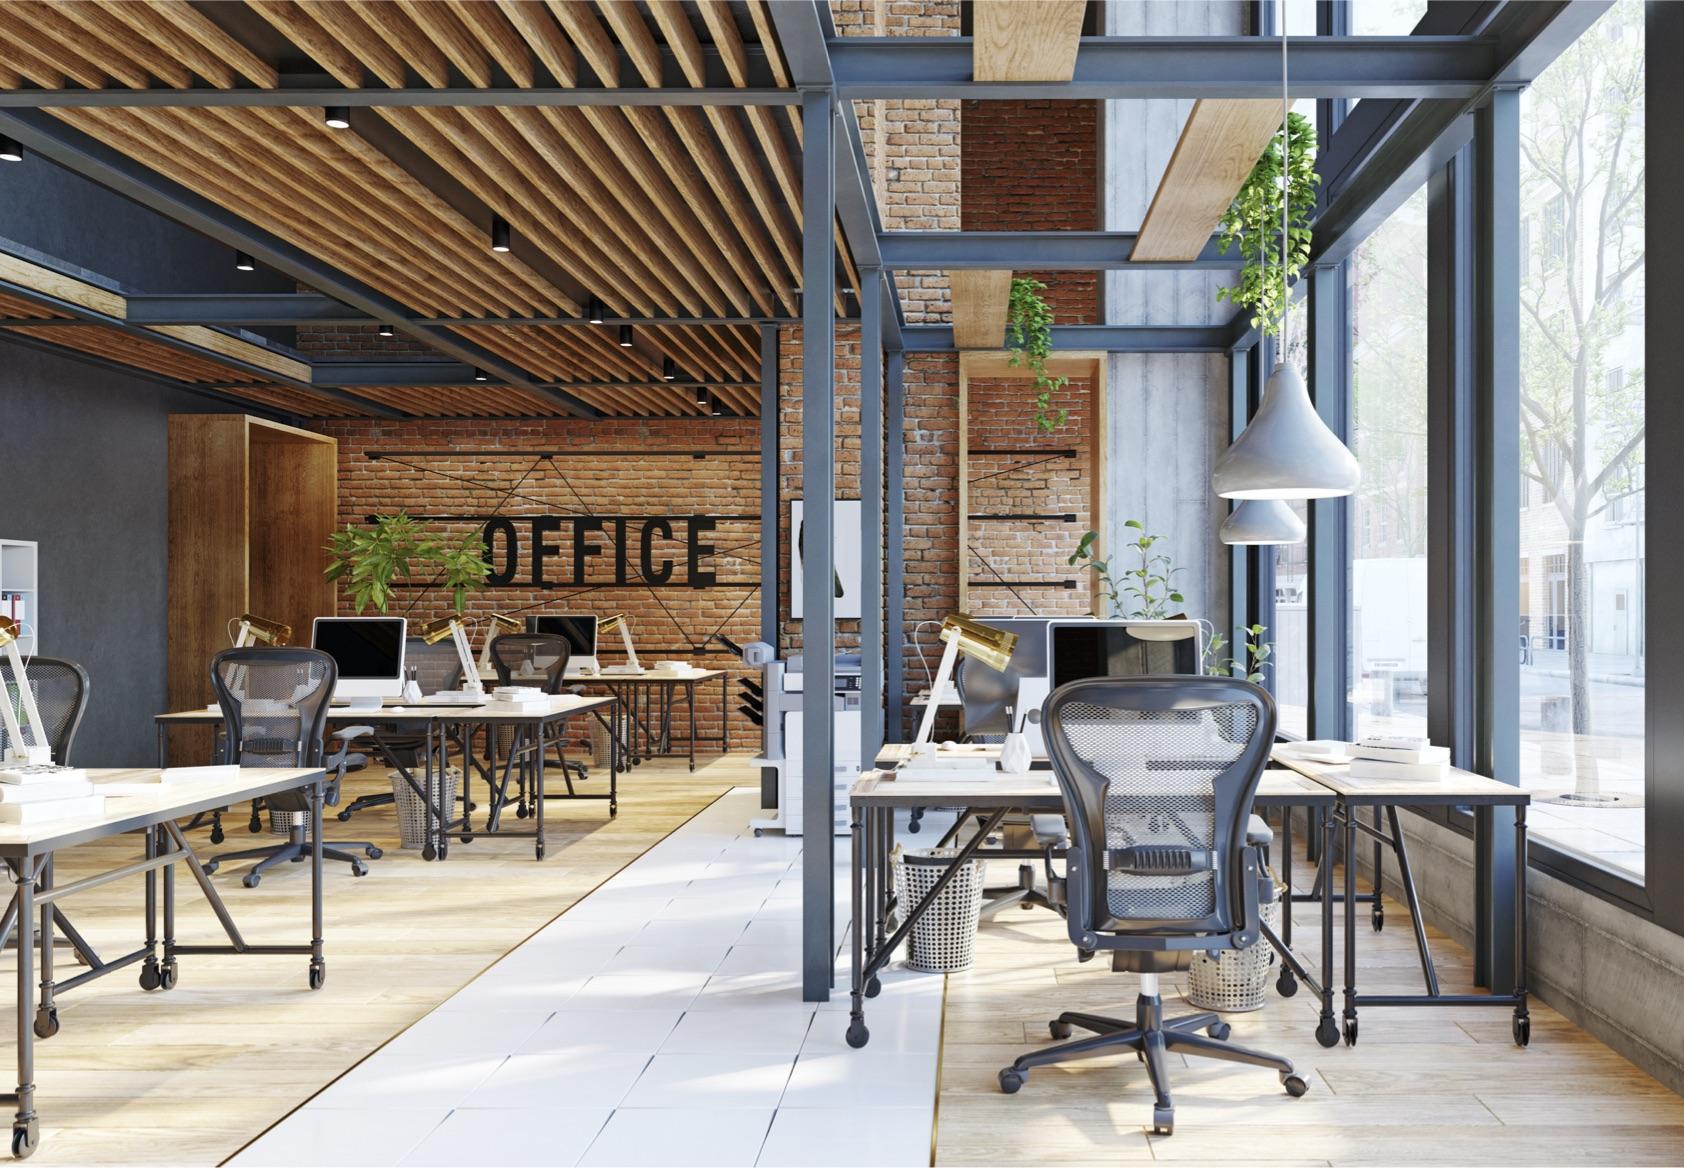 commercial interior design, workspace, office interior design